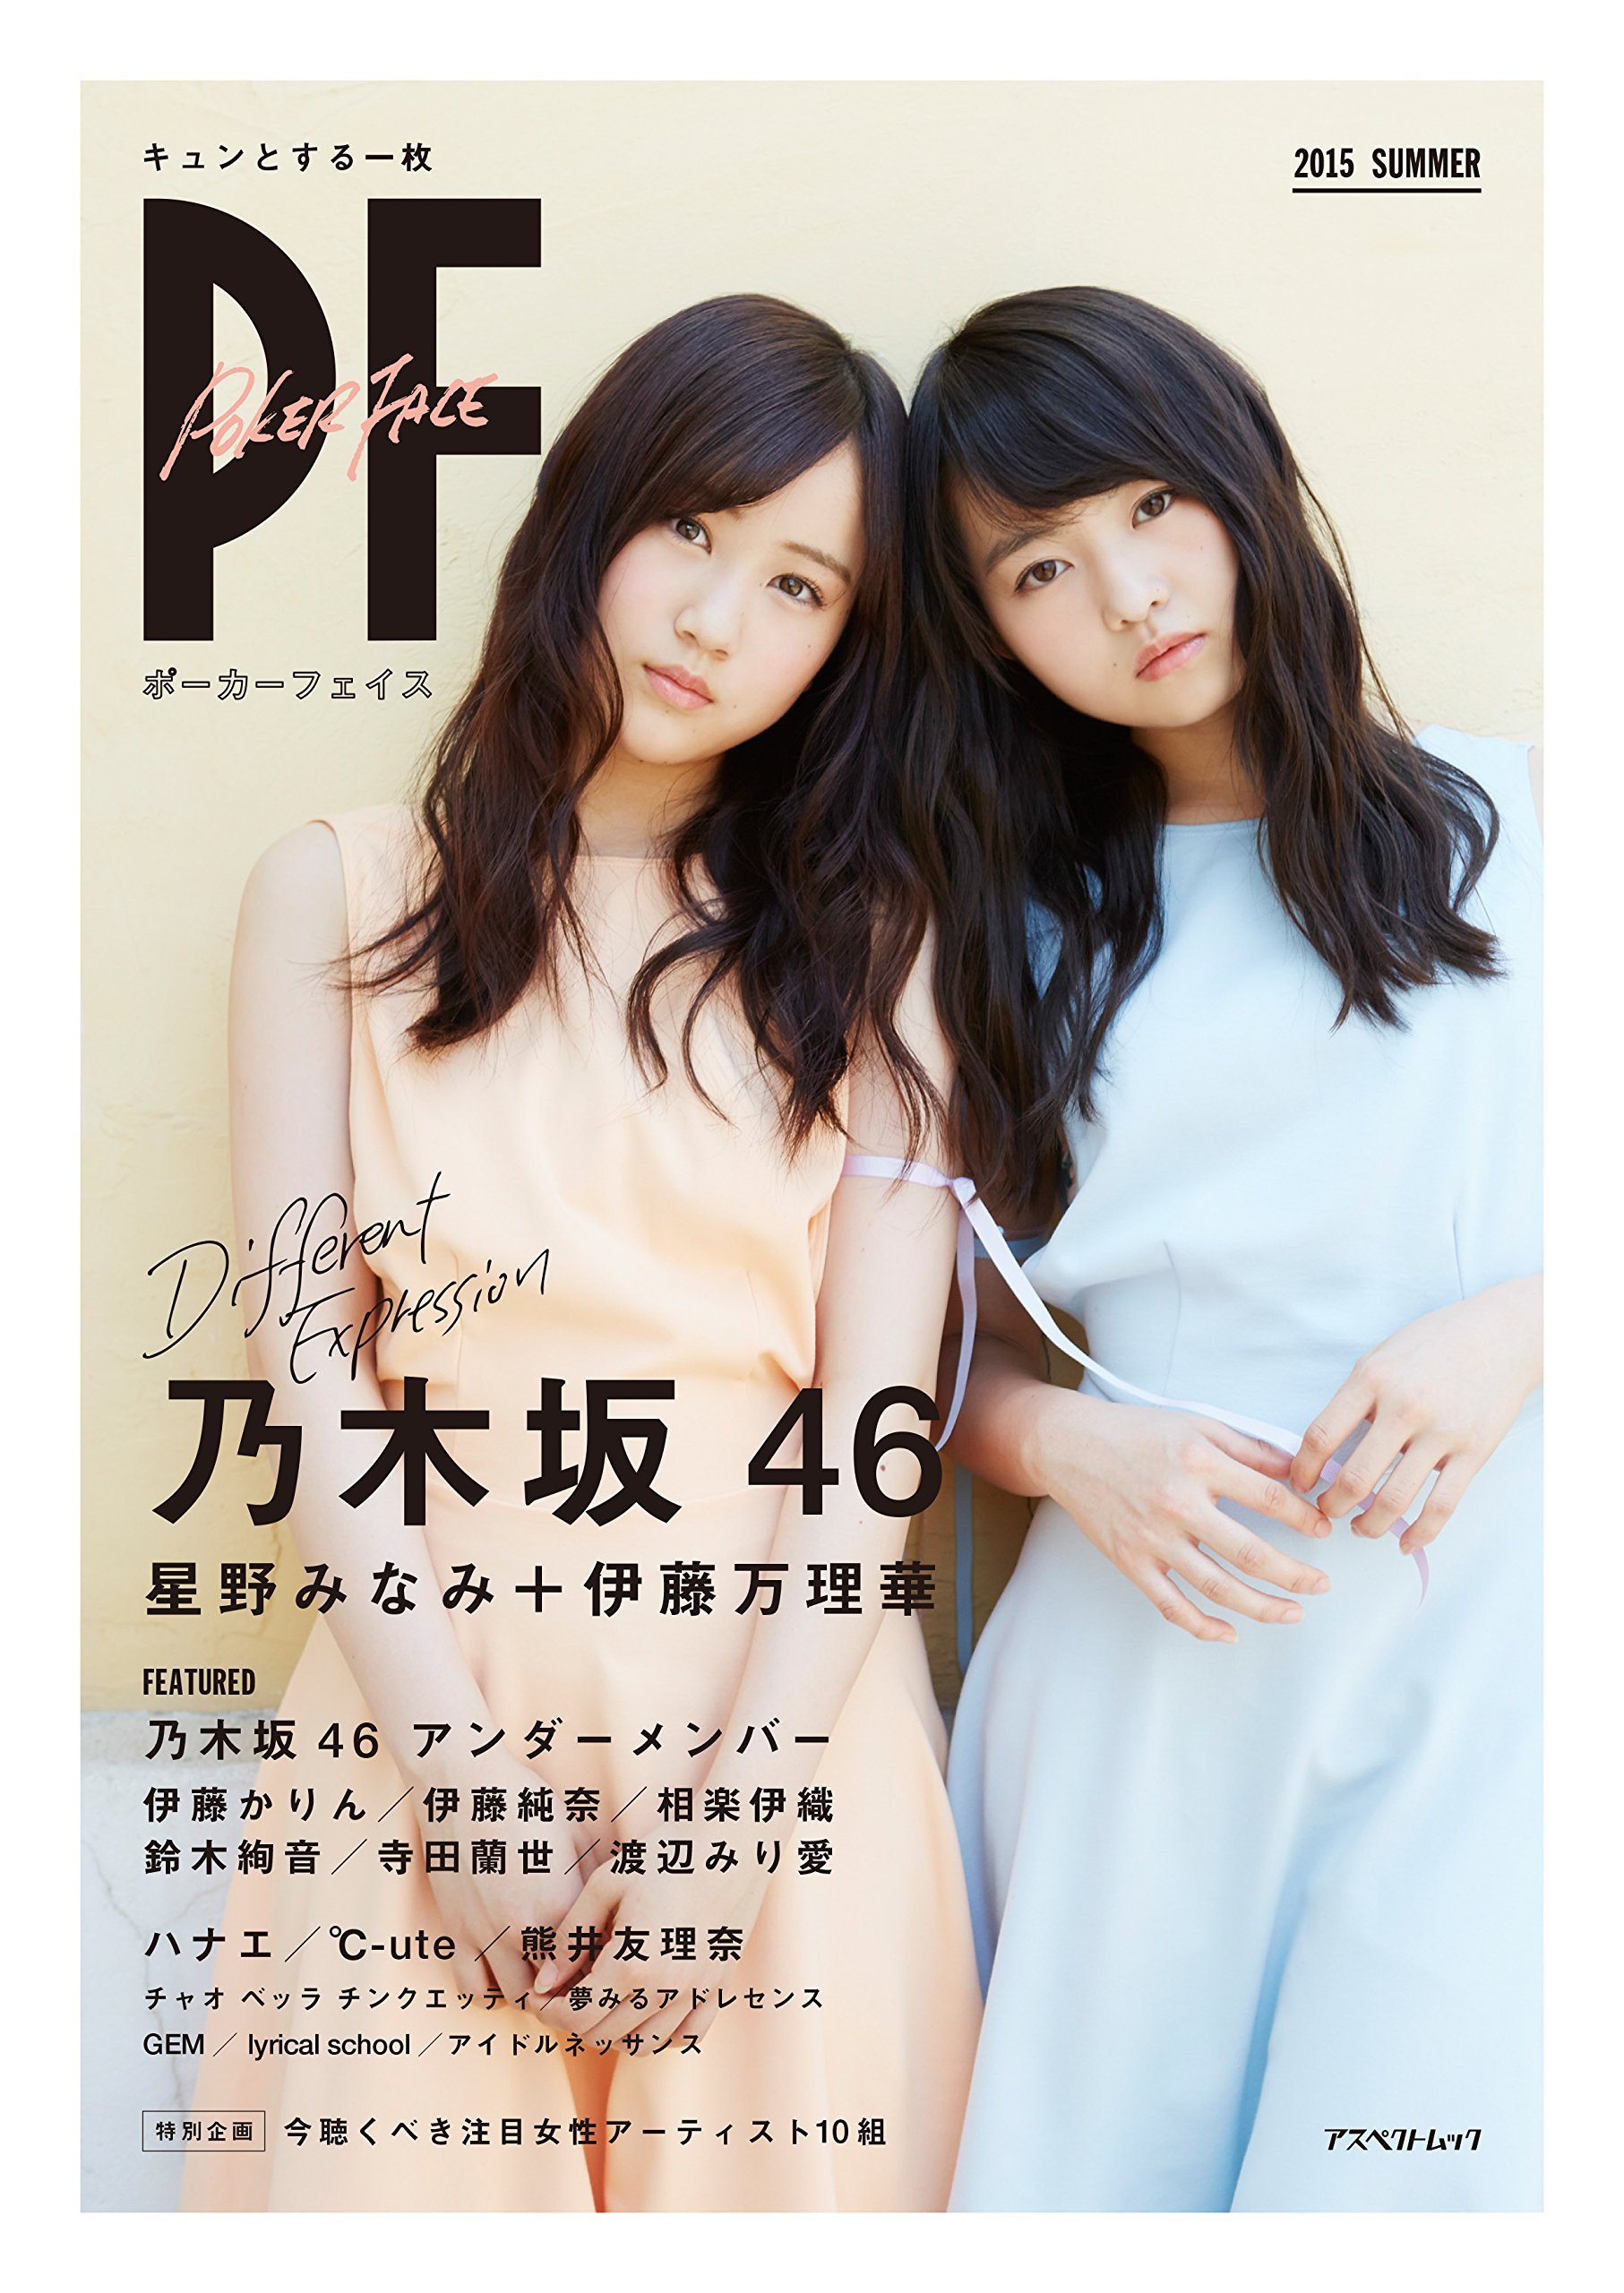 PF(ポーカーフェイス)乃木坂46 星野みなみ+伊藤万理華